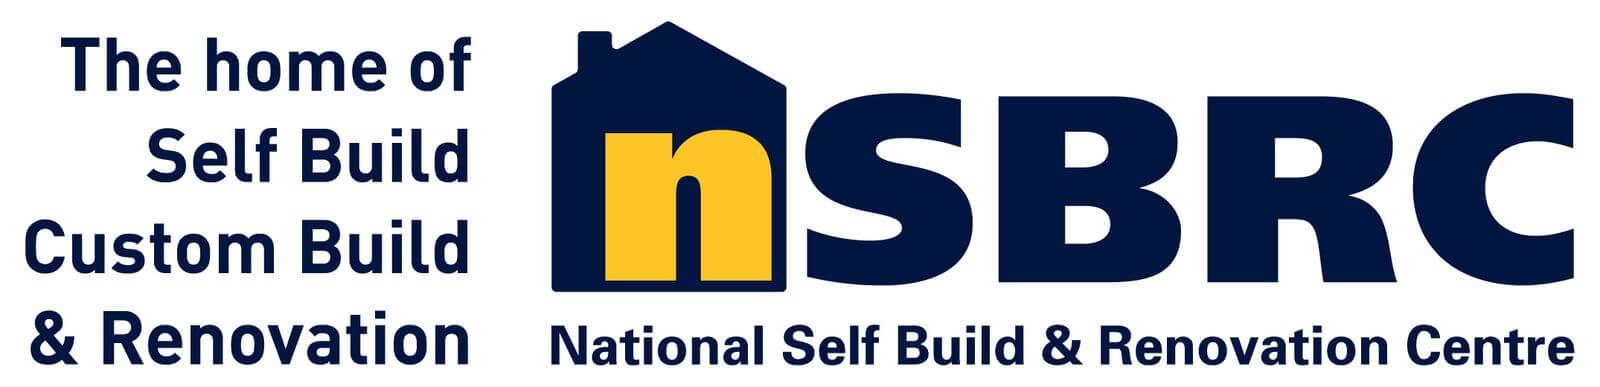 National Self Build and Renovation Centre logo